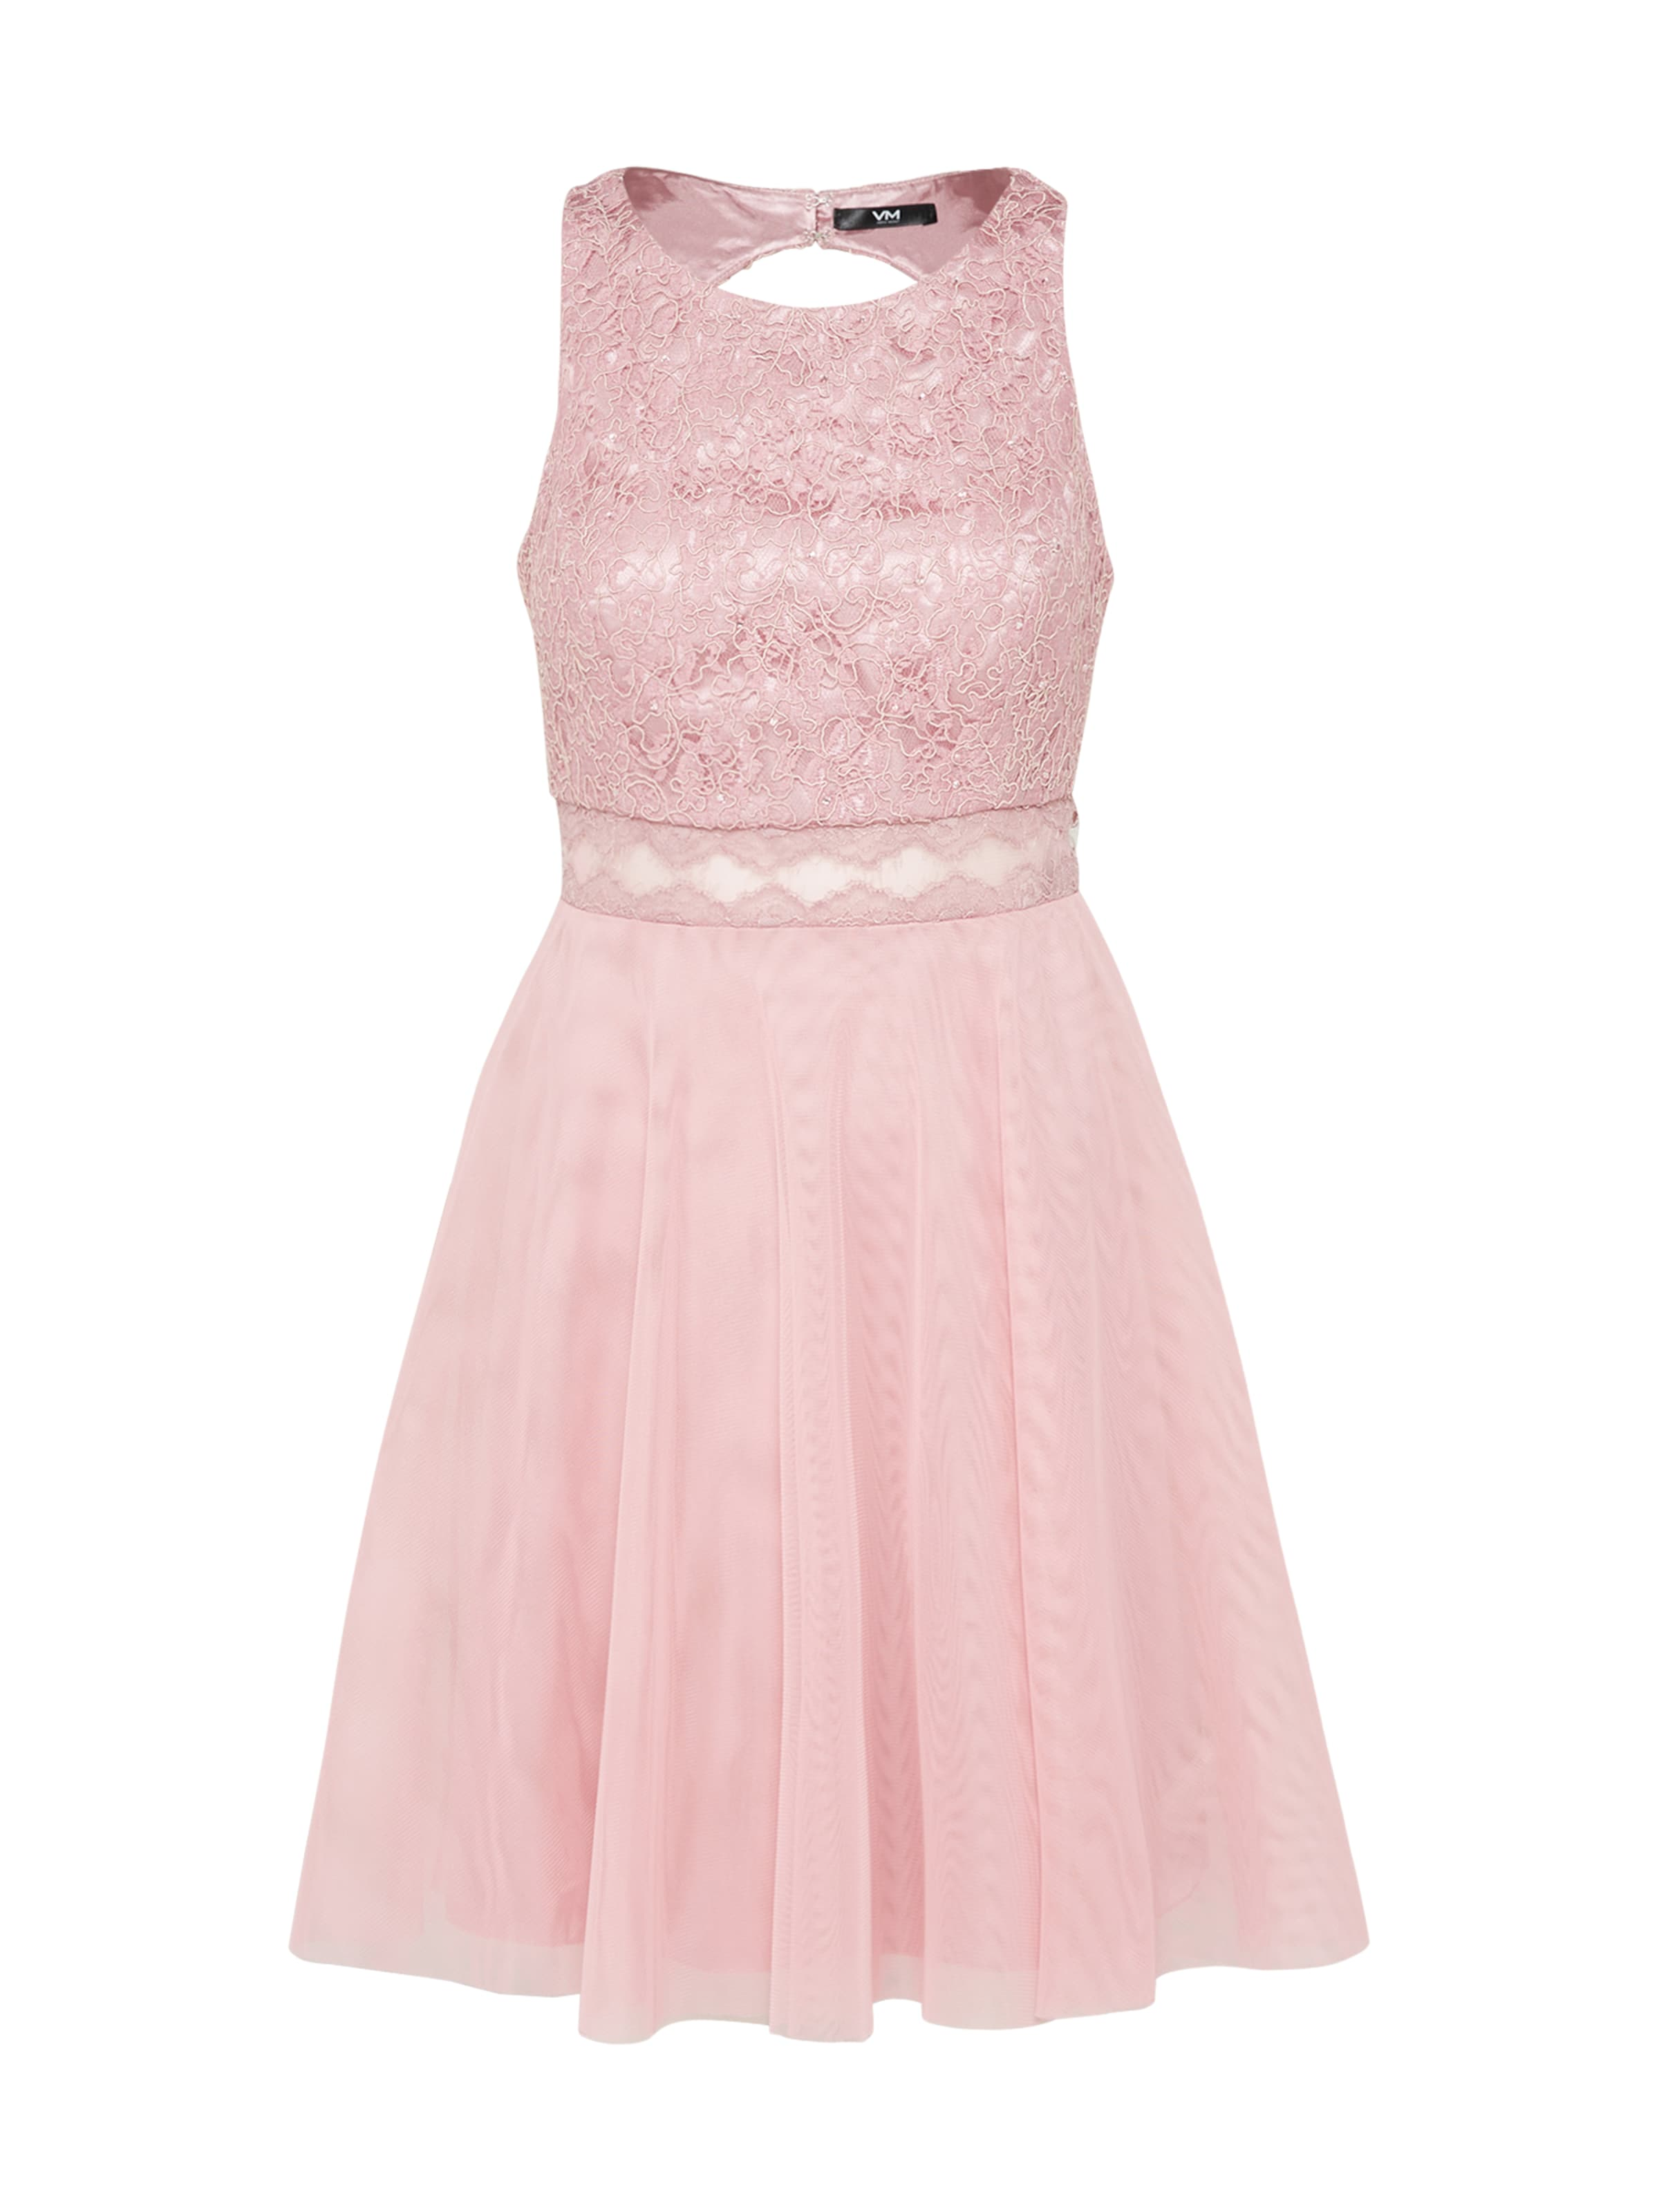 Vm In Rosa Vera Midilänge Kleid Mont R3qA54Lcj